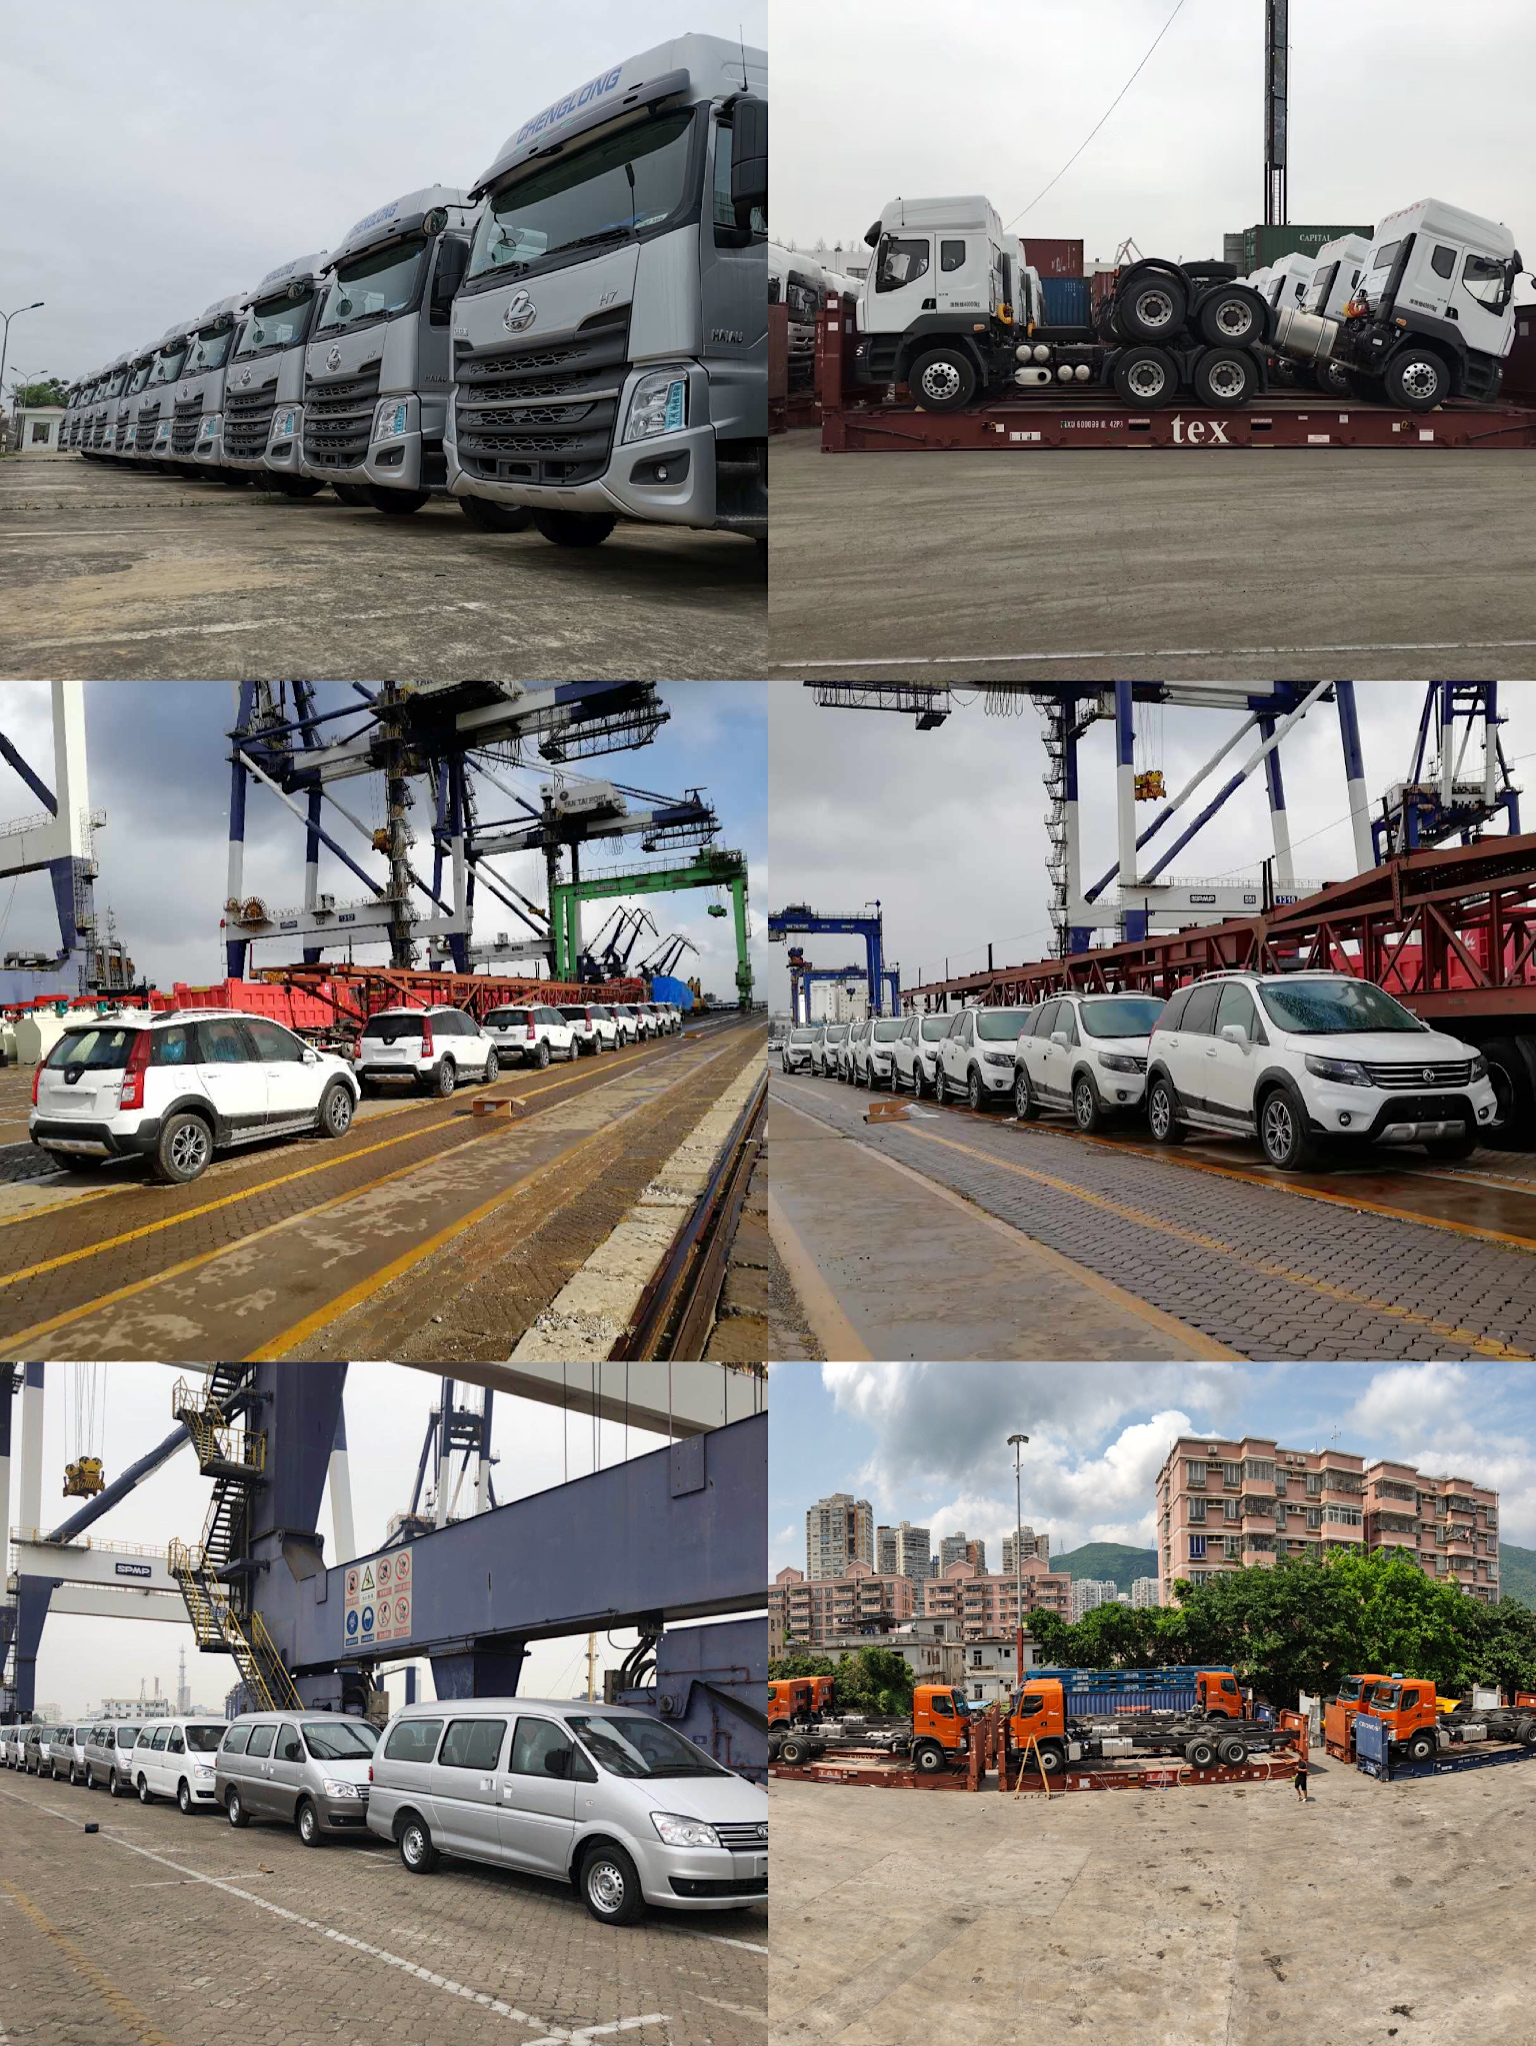 Dongfeng top quality 4x2 dumping truck / mini dump truck 3/5 ton tipper truck  M3 single cabin LHD/RHD for sale